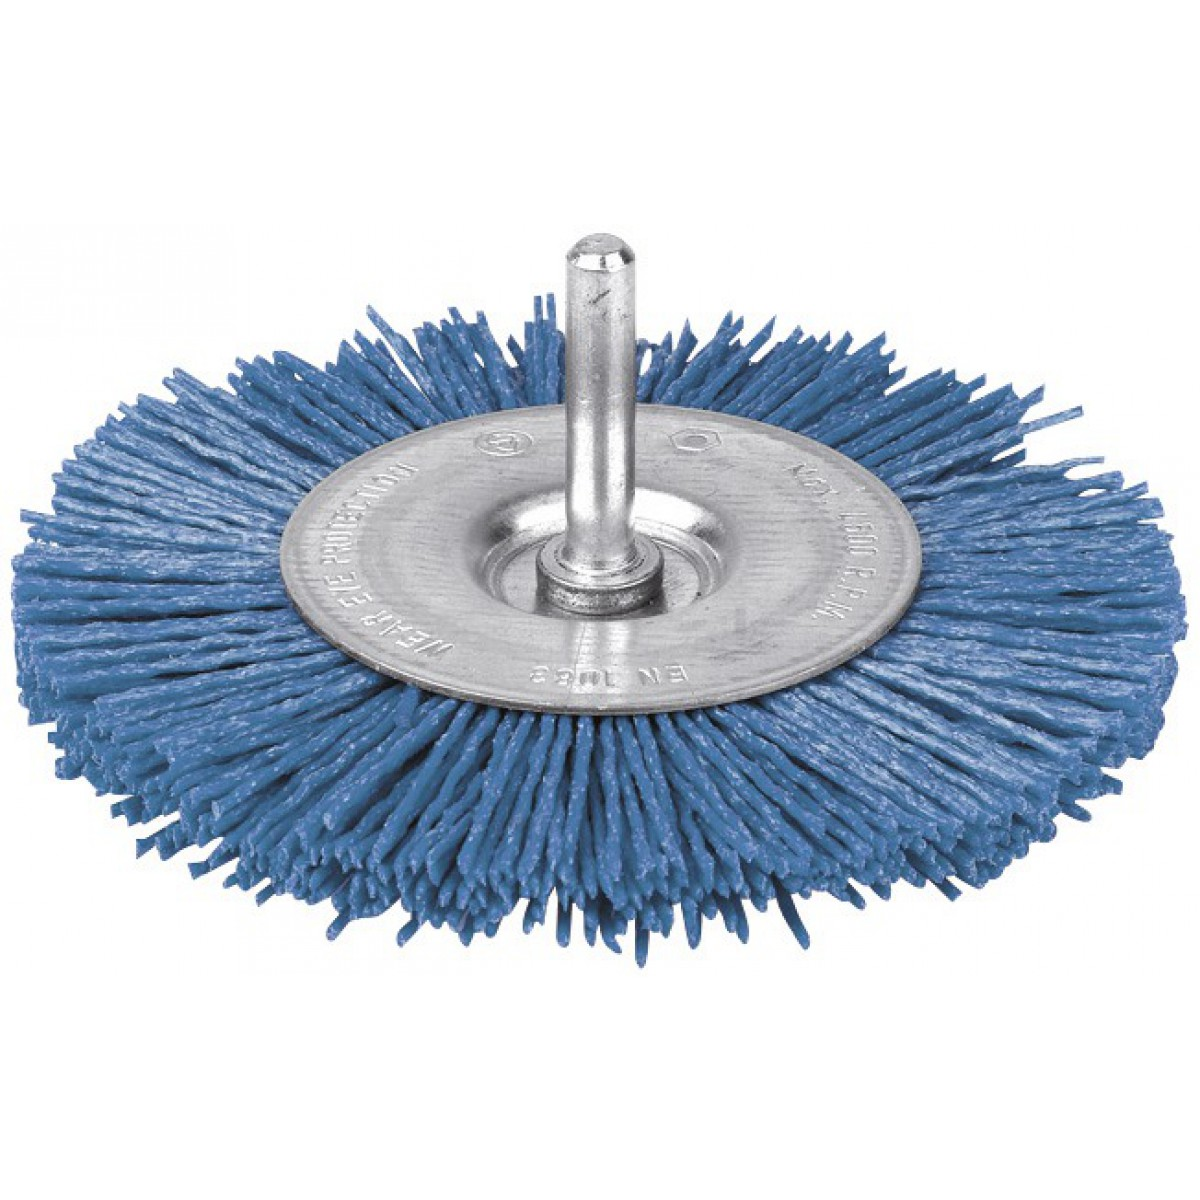 Brosse circulaire nylon bleu SCID - Diamètre 75 mm